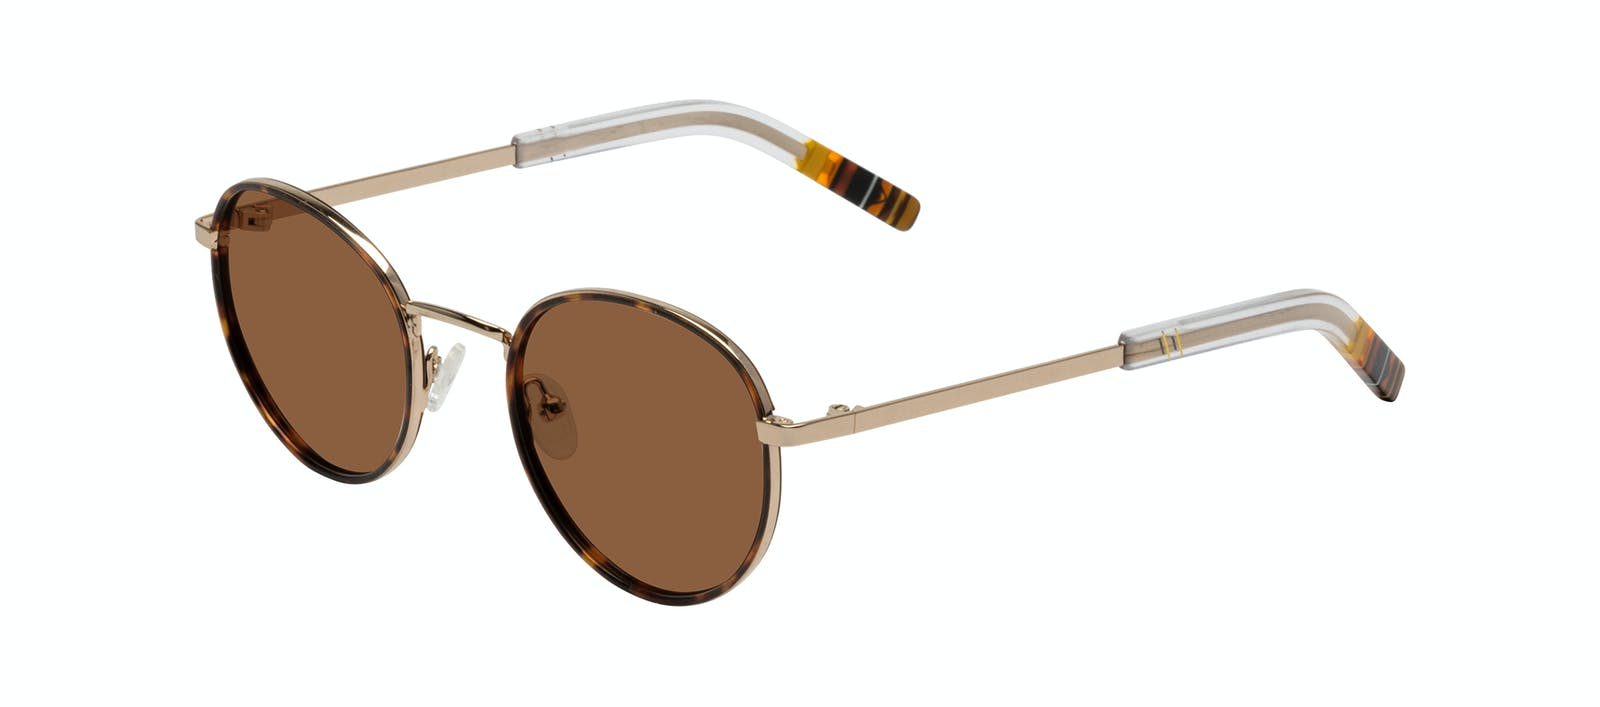 3307cbd82b8 Affordable Fashion Glasses Round Sunglasses Men Reach Tortoise Tilt